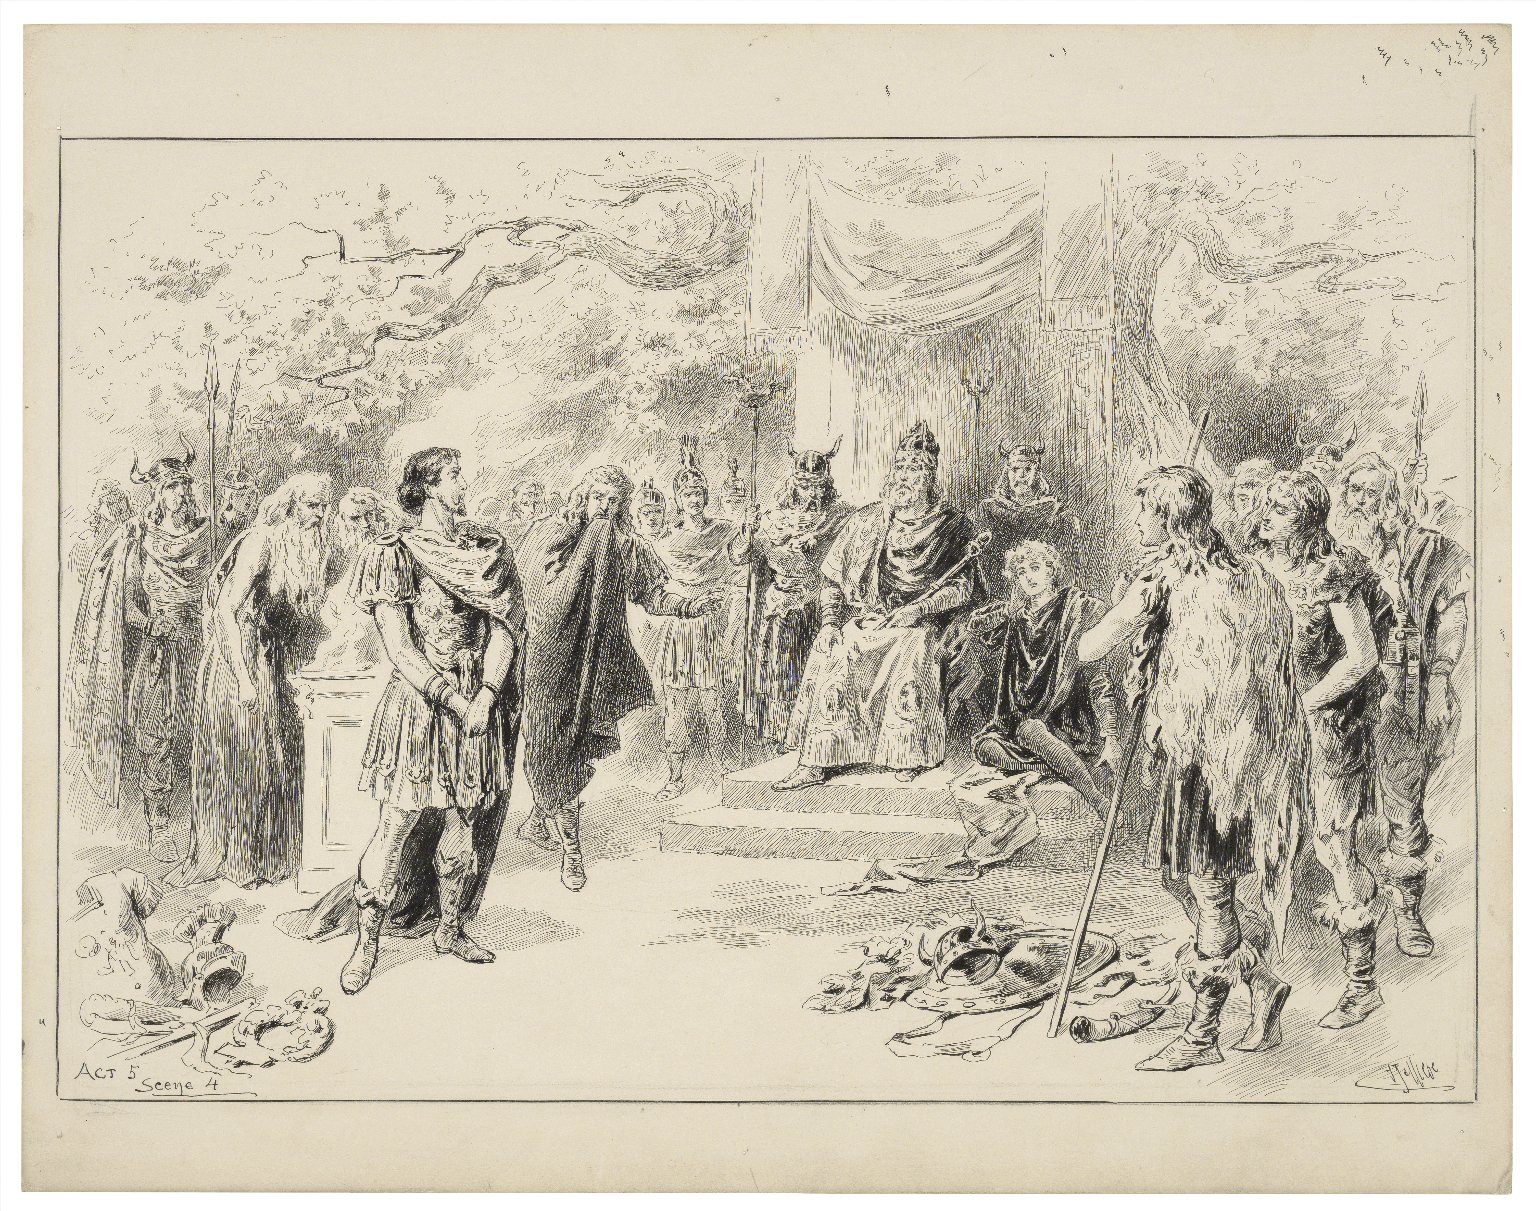 [Cymbeline, V, 4, Lyceum Theatre, October 3, 1896, Sir Henry Irving as Iachimo, Ellen Terry as Imogen, Mr. Macklin as Cymbeline] [graphic] / J. Jellicoe.